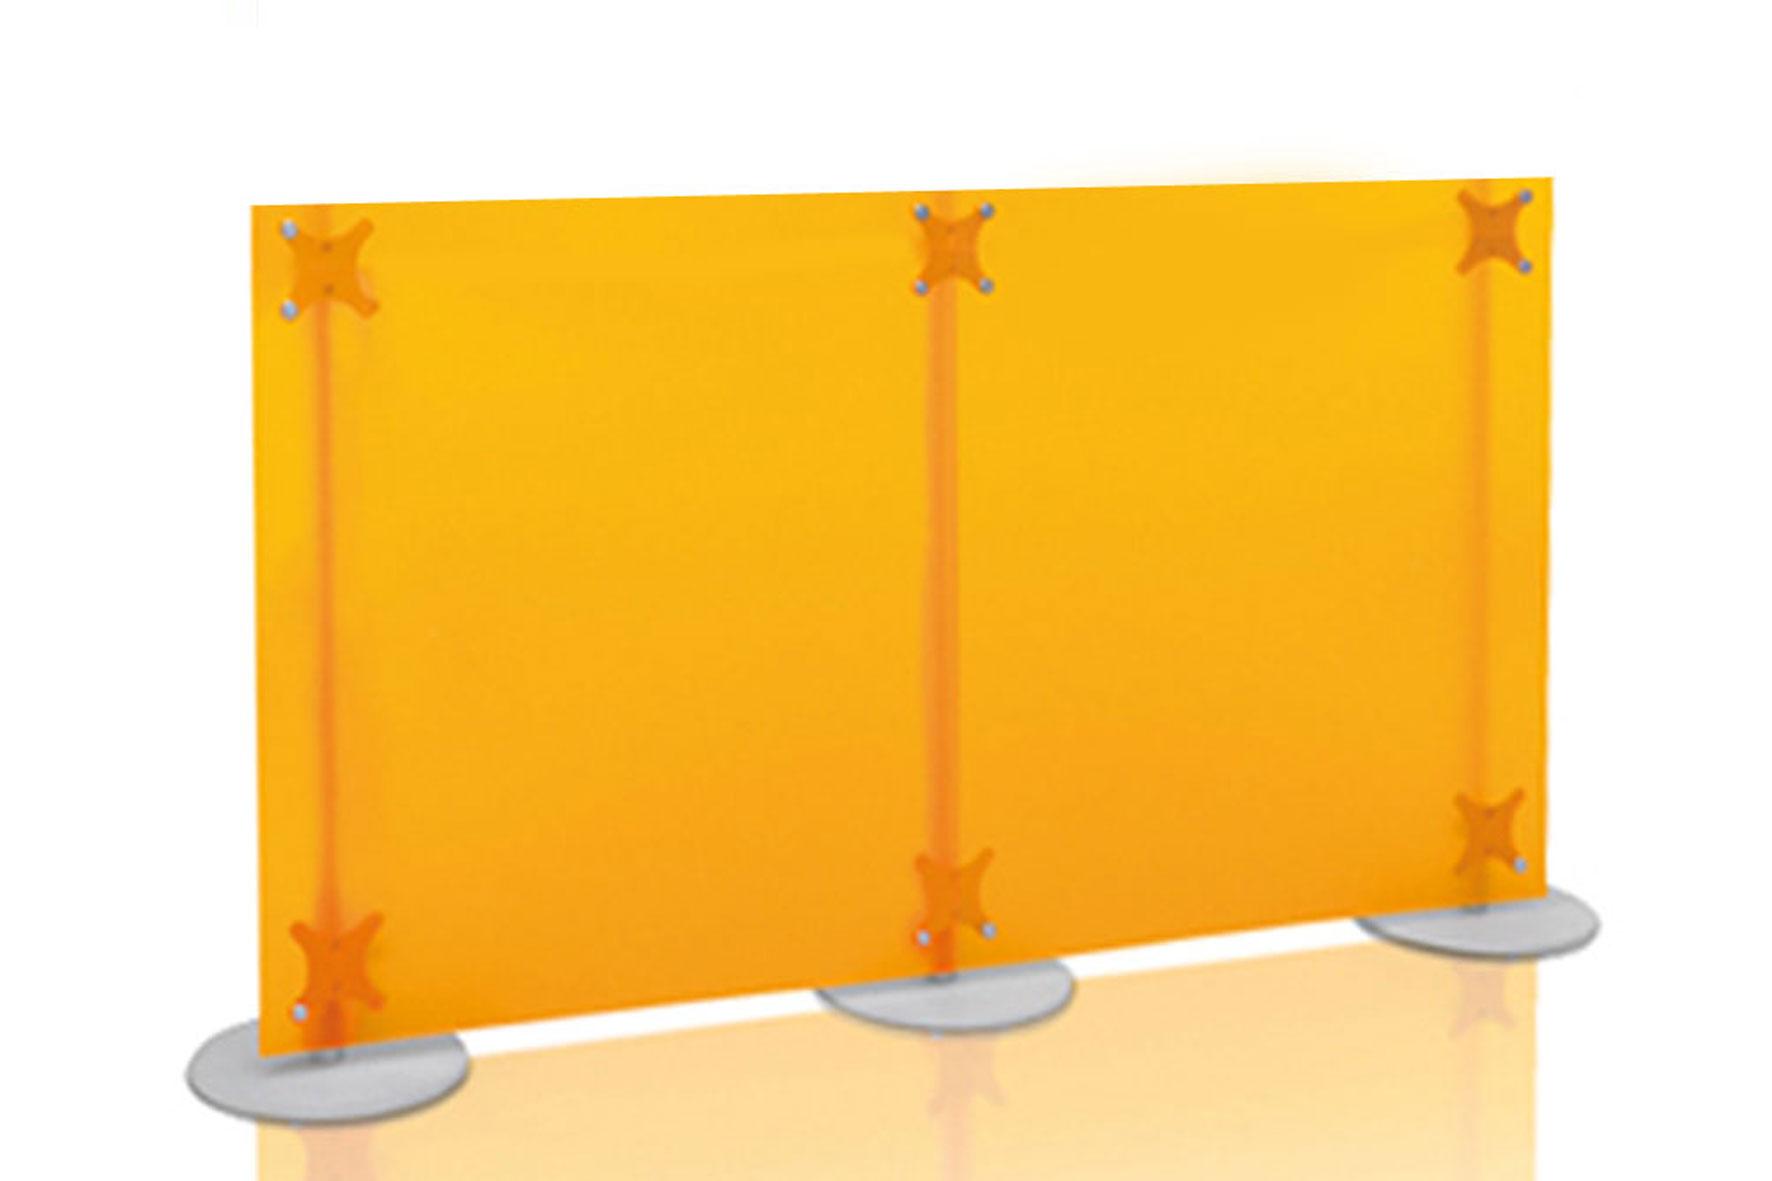 parete divisoria 2x1 per uffici